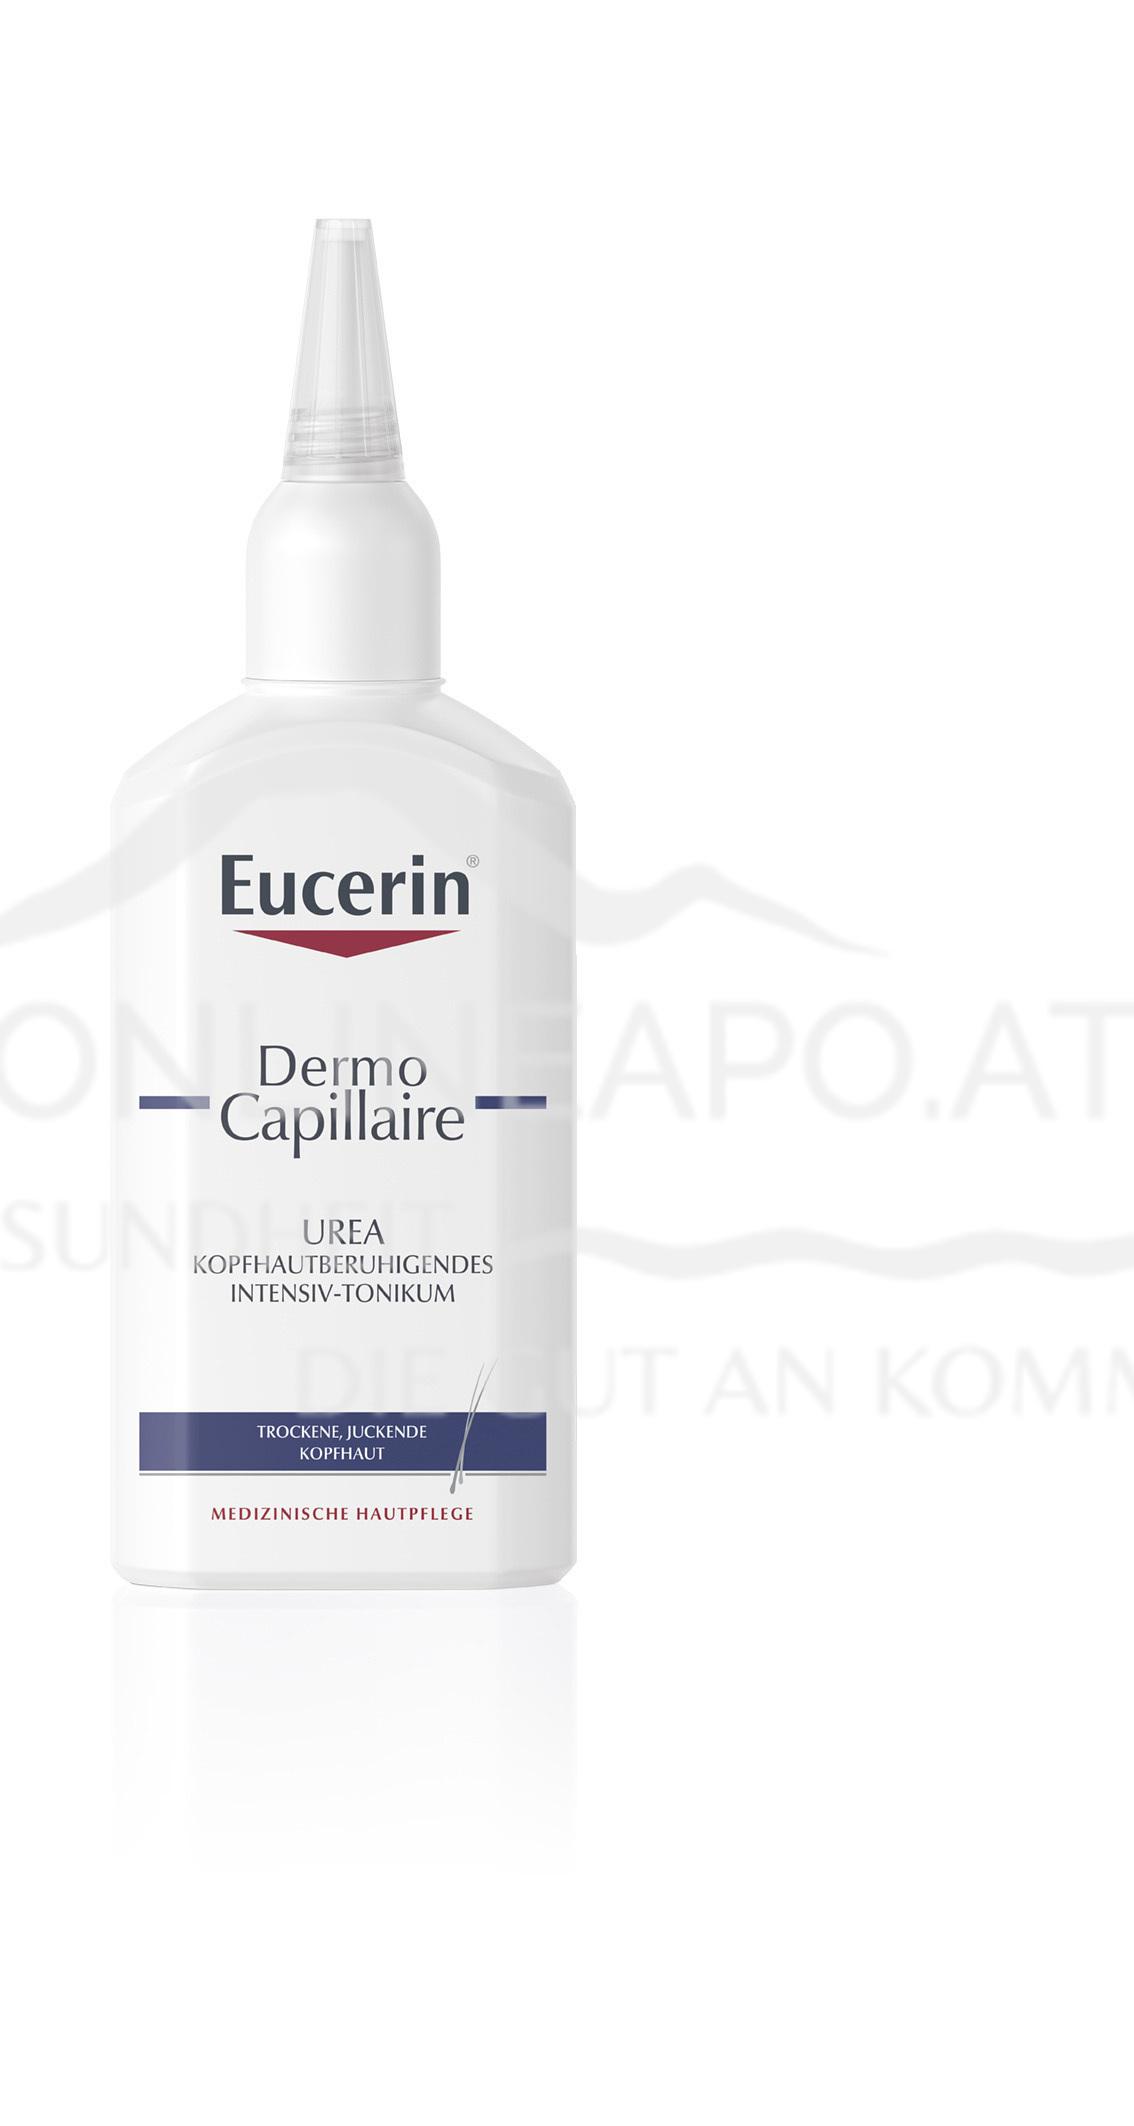 Eucerin DermoCapillaire Urea Intensiv-Tonikum Kopfhautberuhigend